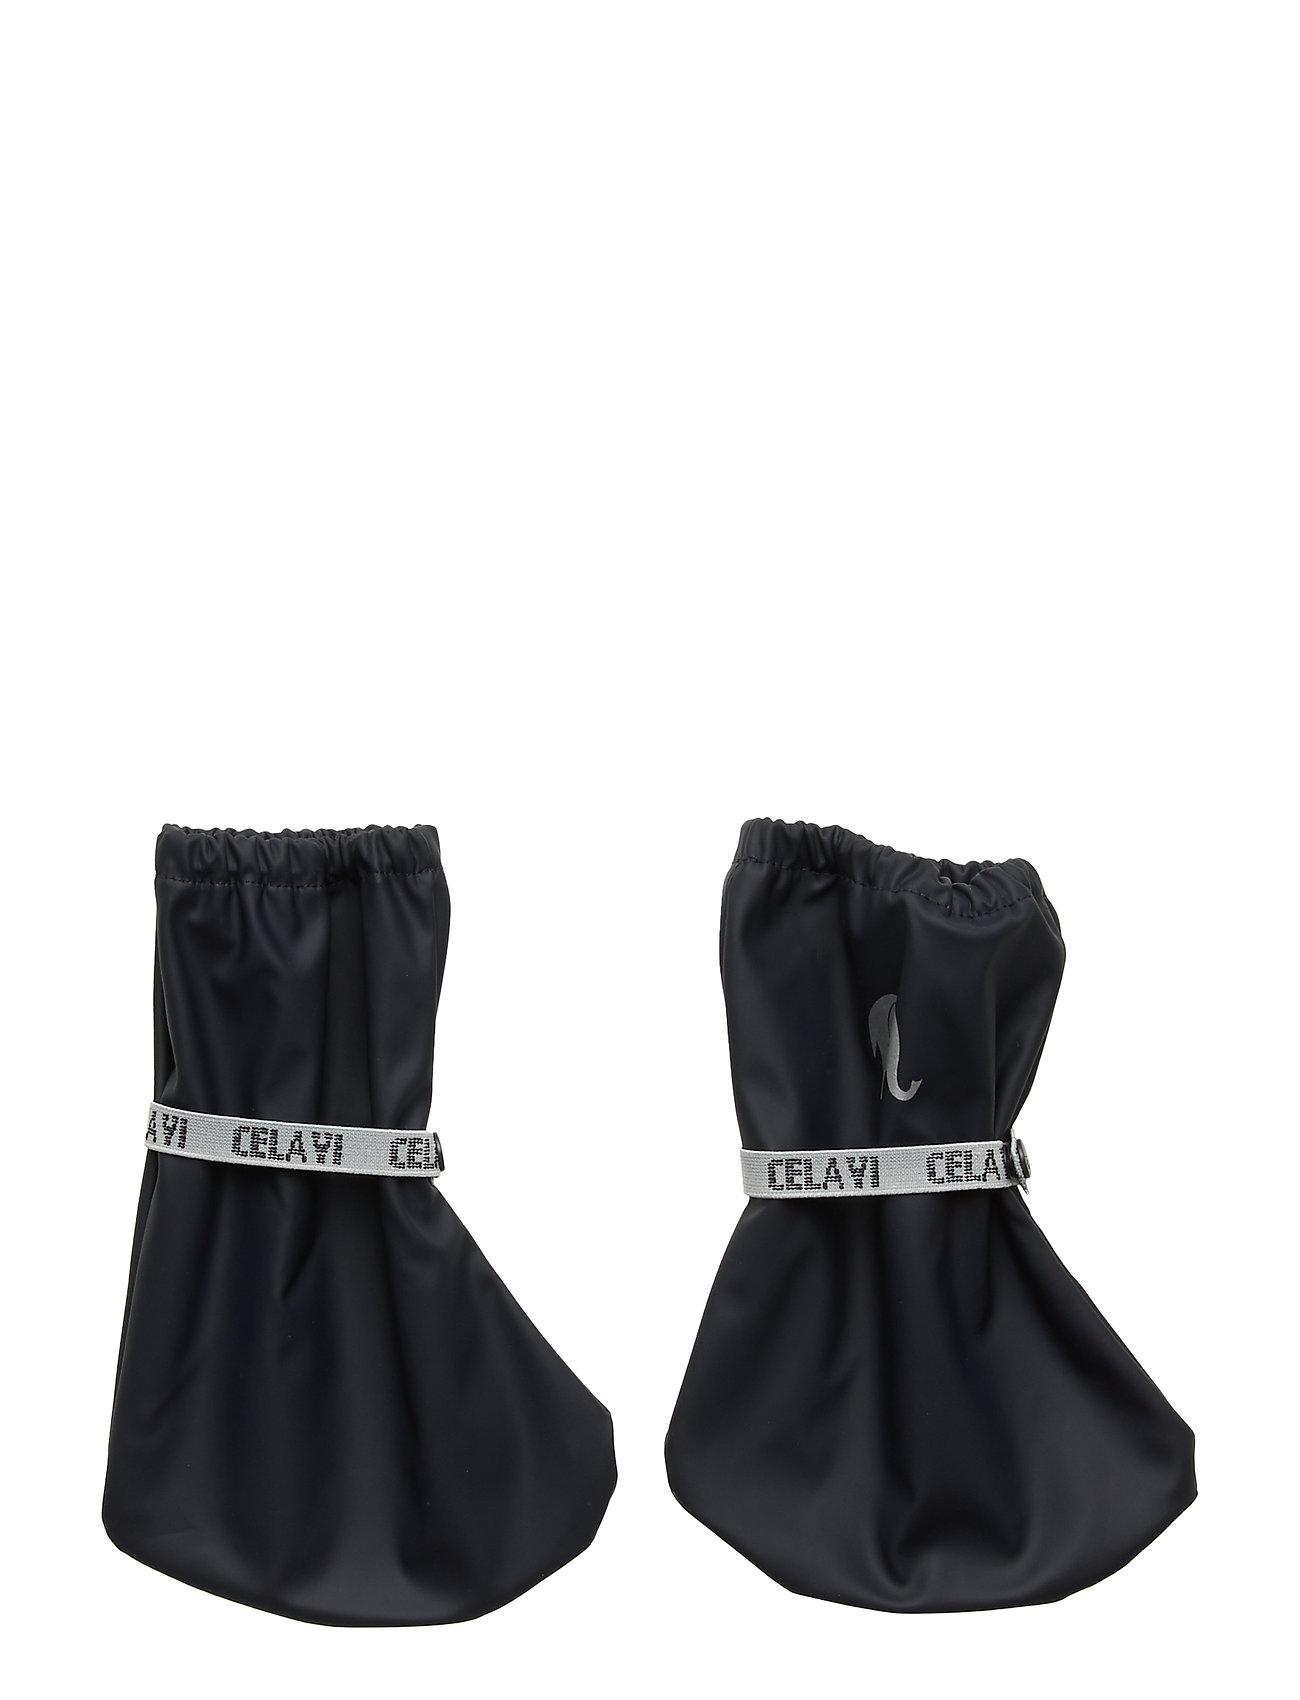 Image of Pu-Footies W/O Padding Outerwear Rainwear Accessories Blå CeLaVi (3464118485)